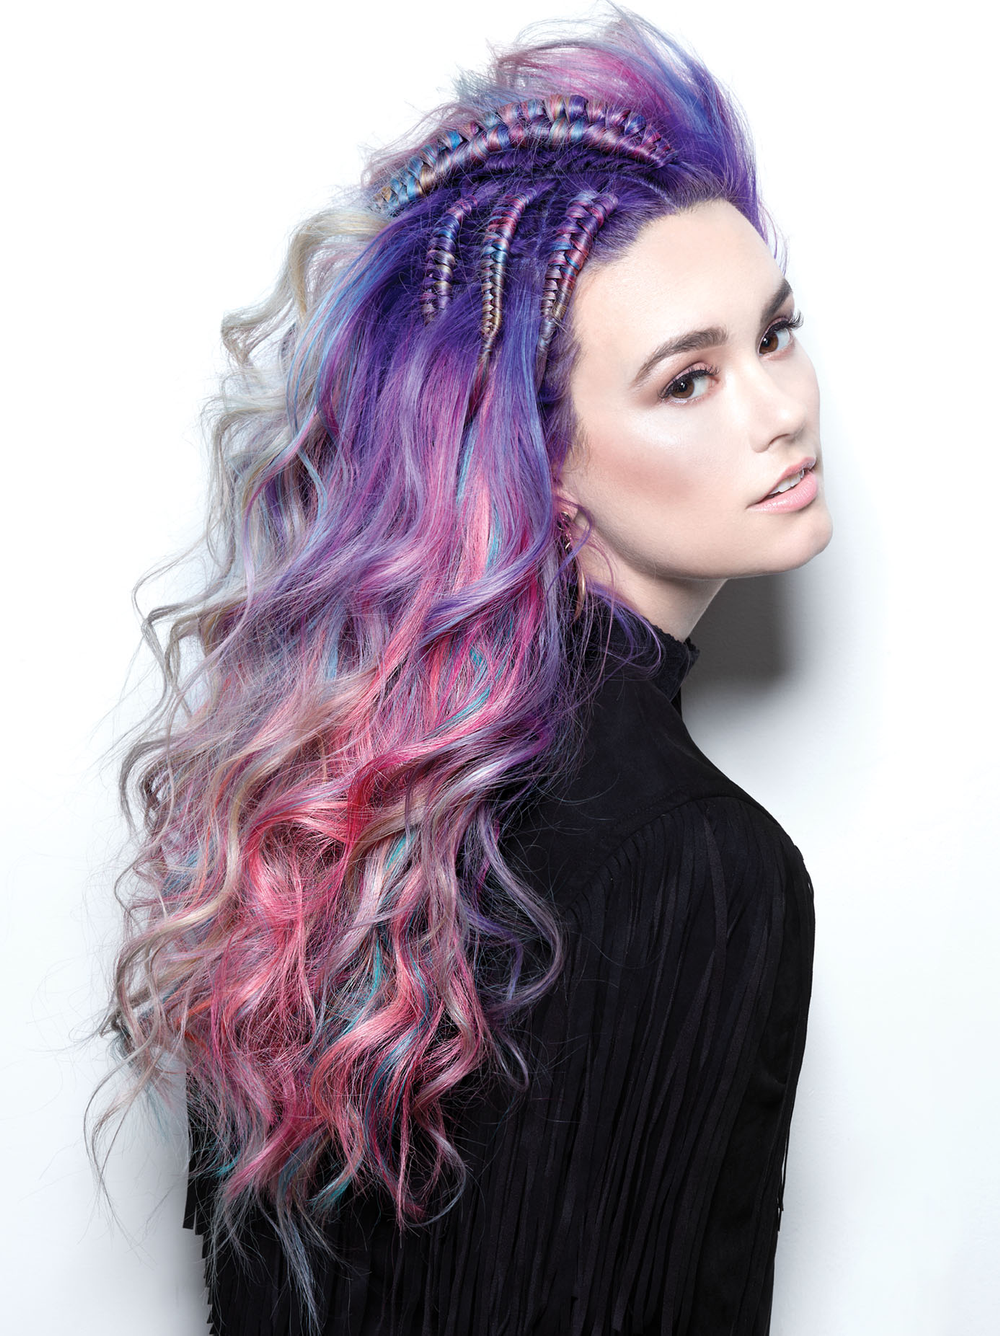 <p>Hair: Sydney Lopez + Antonio Estrada for R+Co and Great Lengths</p> <p>Photographer: Roberto Ligresti</p> <p>Makeup: David Maderich and Jacquelyn Jordan</p> <p>Nails: Galyna Poczciwinski</p>